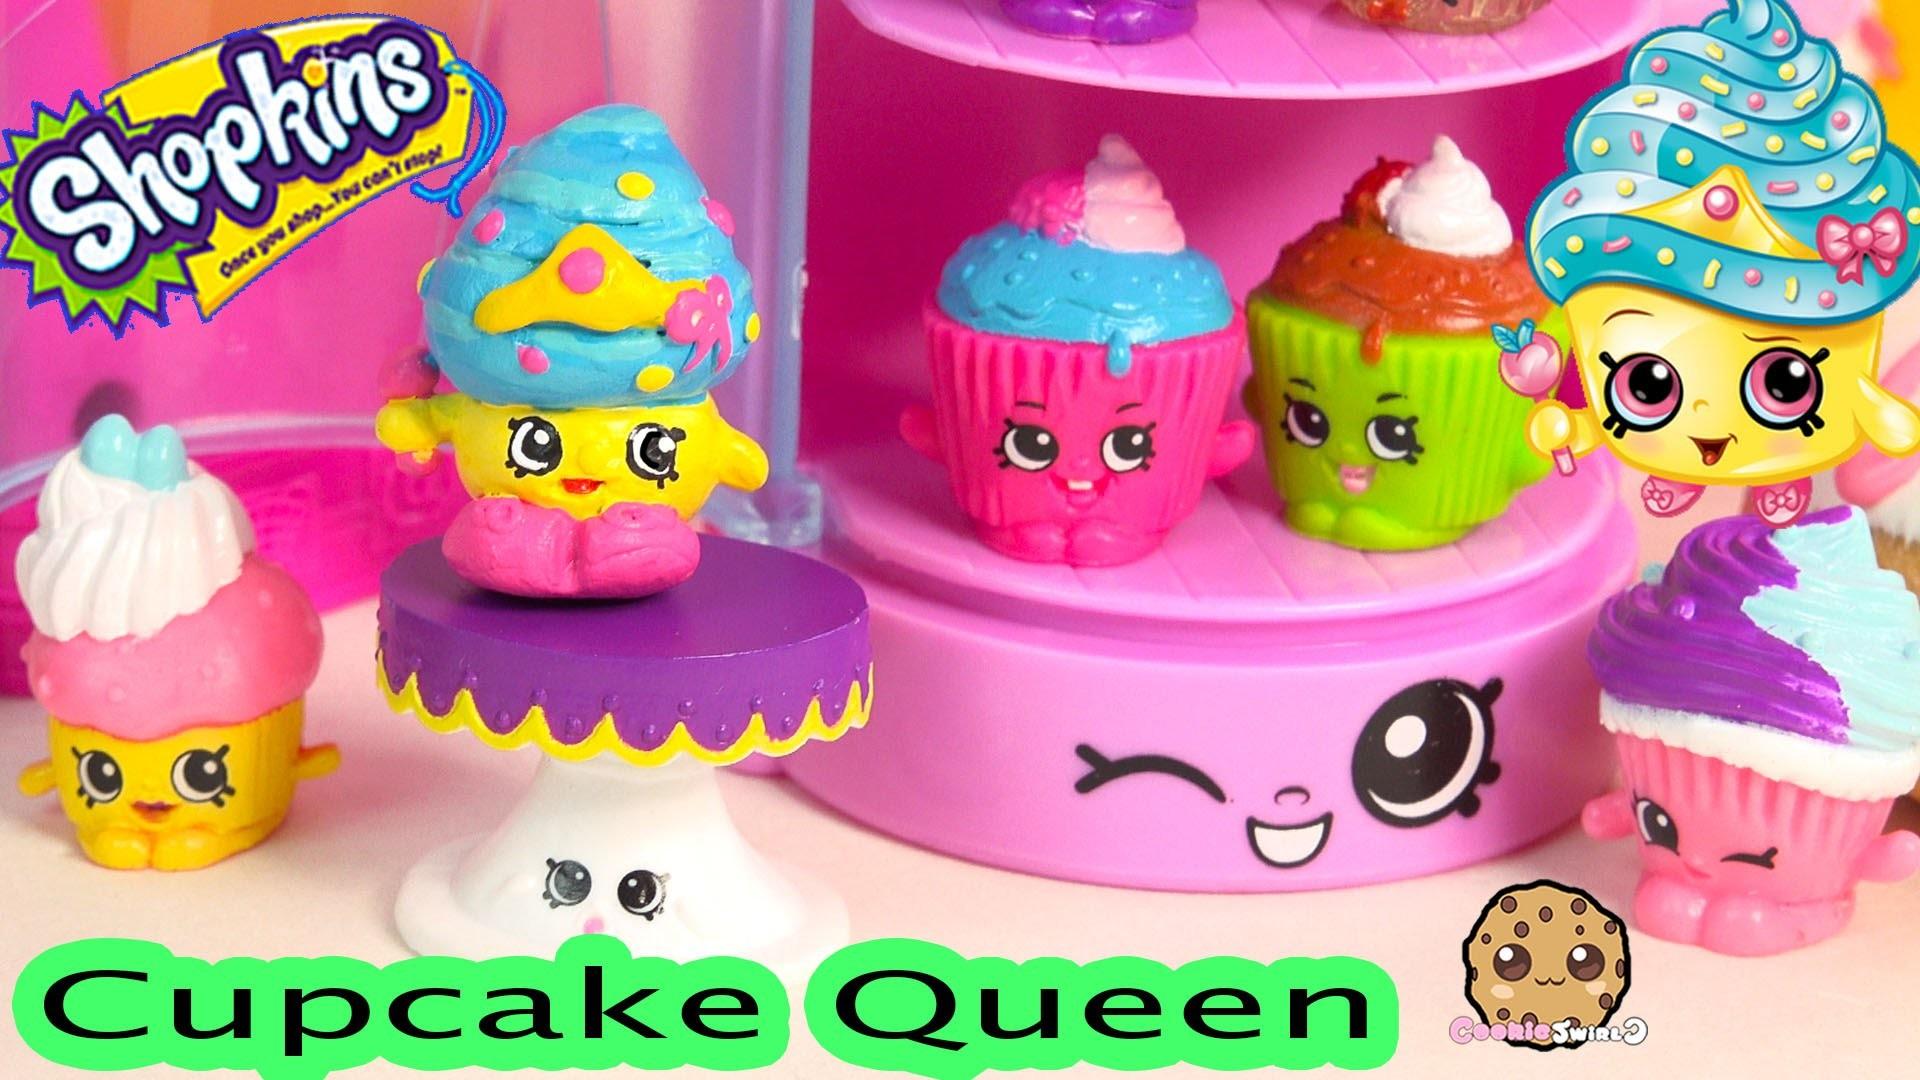 DIY Craft Limited Edition Shopkins Season 1 CUPCAKE QUEEN Custom Paint  Cookieswirlc Video – YouTube